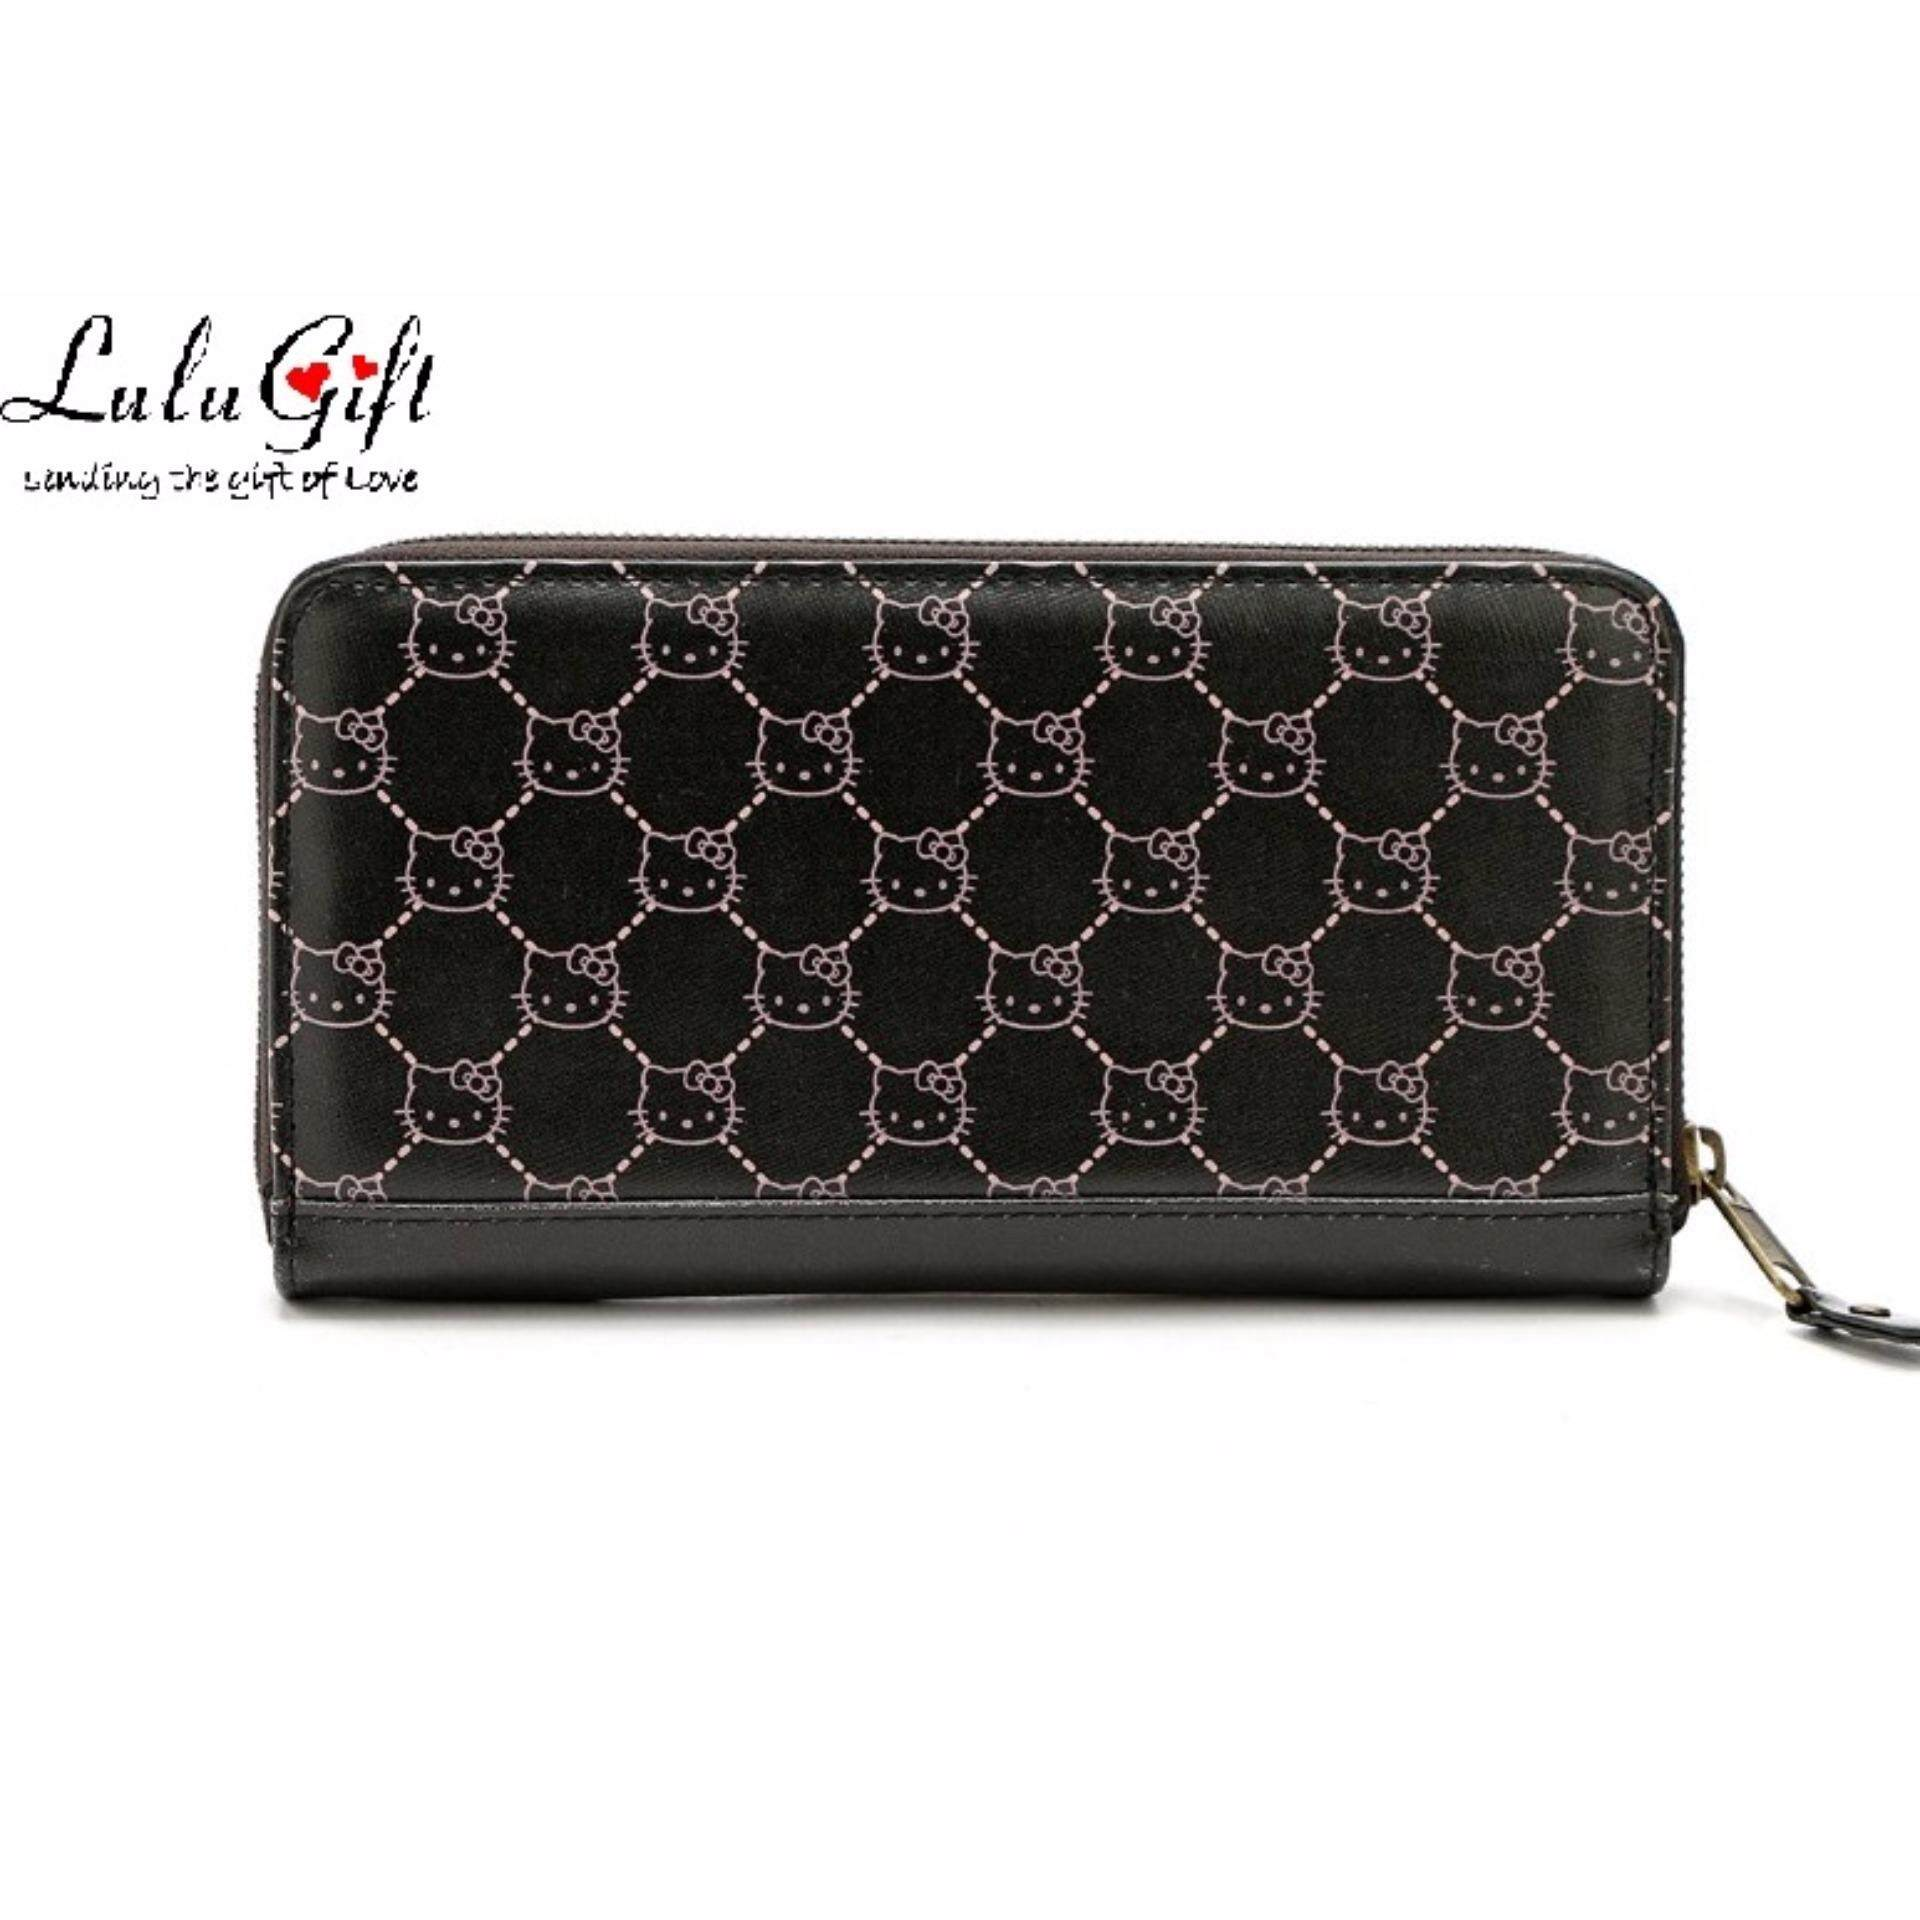 Lulugift Cute Kitty New Fashion PU Leather Wallet